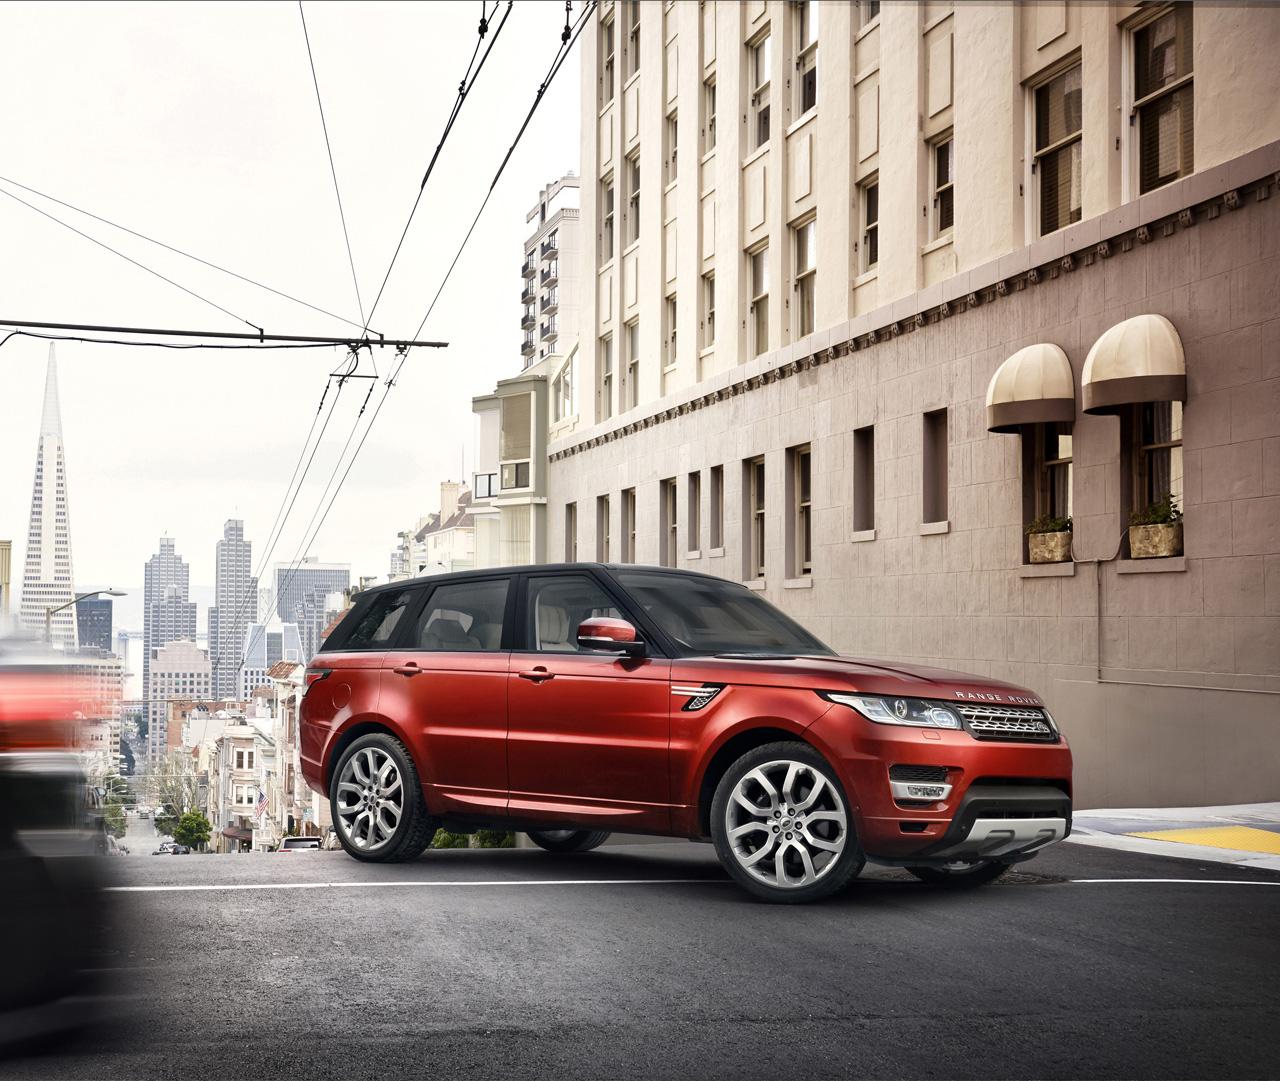 2014 Range Rover Sport Online Configurator Launched